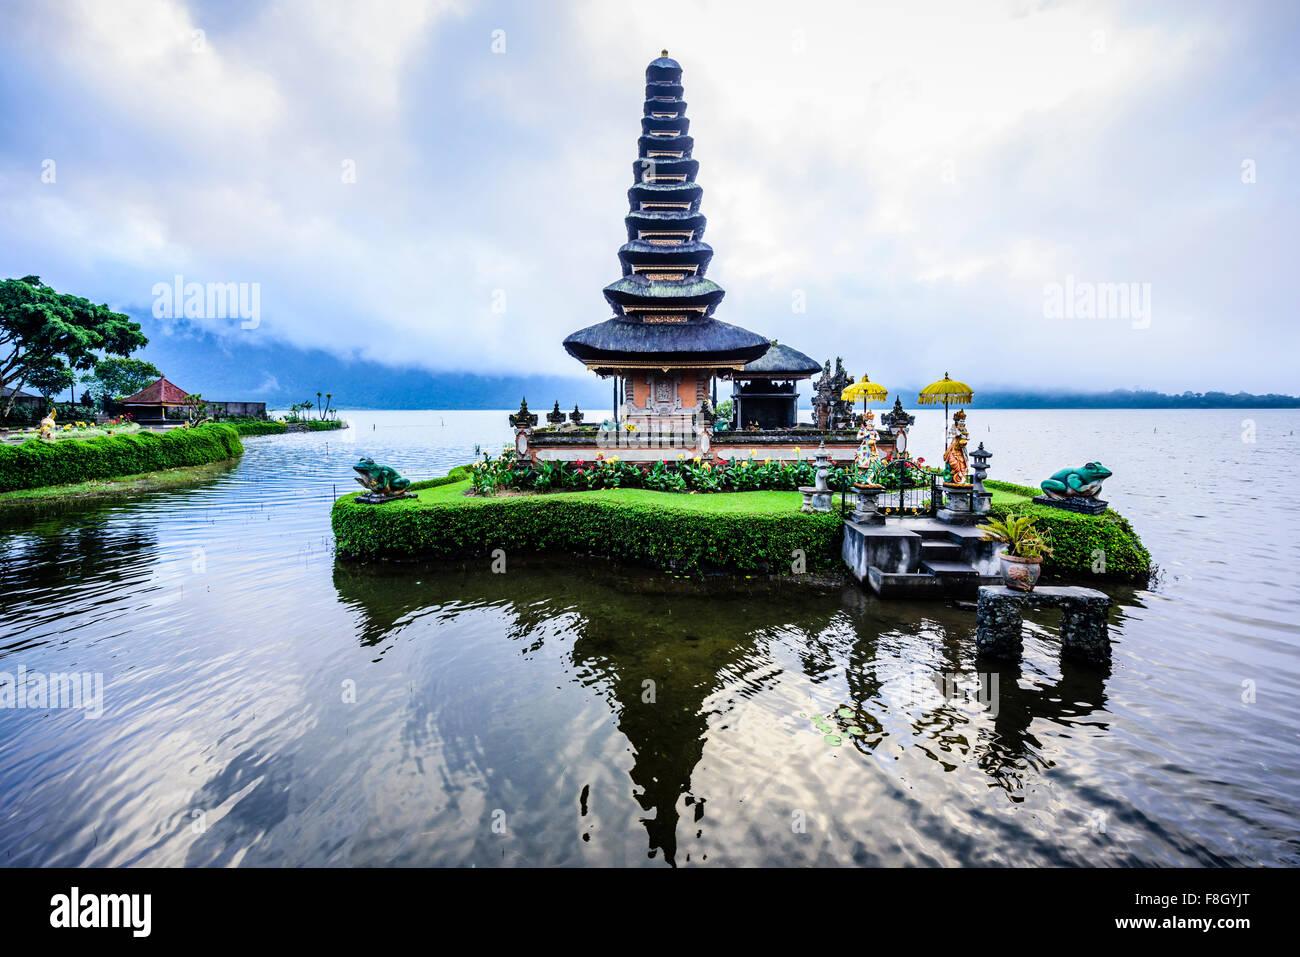 Pagoda flottant sur l'eau, Baturiti, Bali, Indonésie Photo Stock